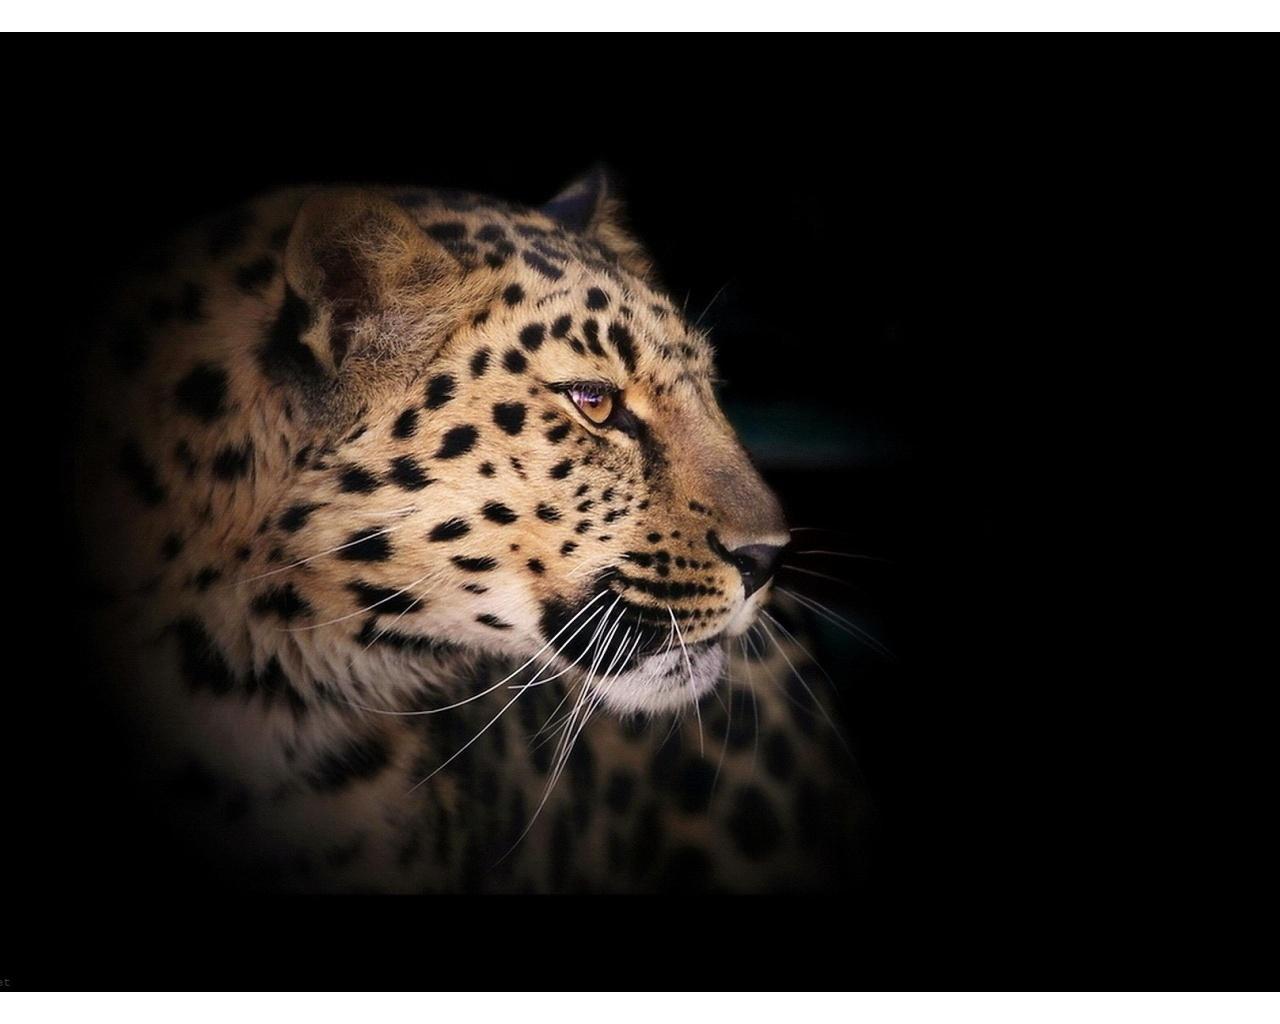 Leopard Wild Cat A Dark Wallpapers - 1280x1024 - 204596